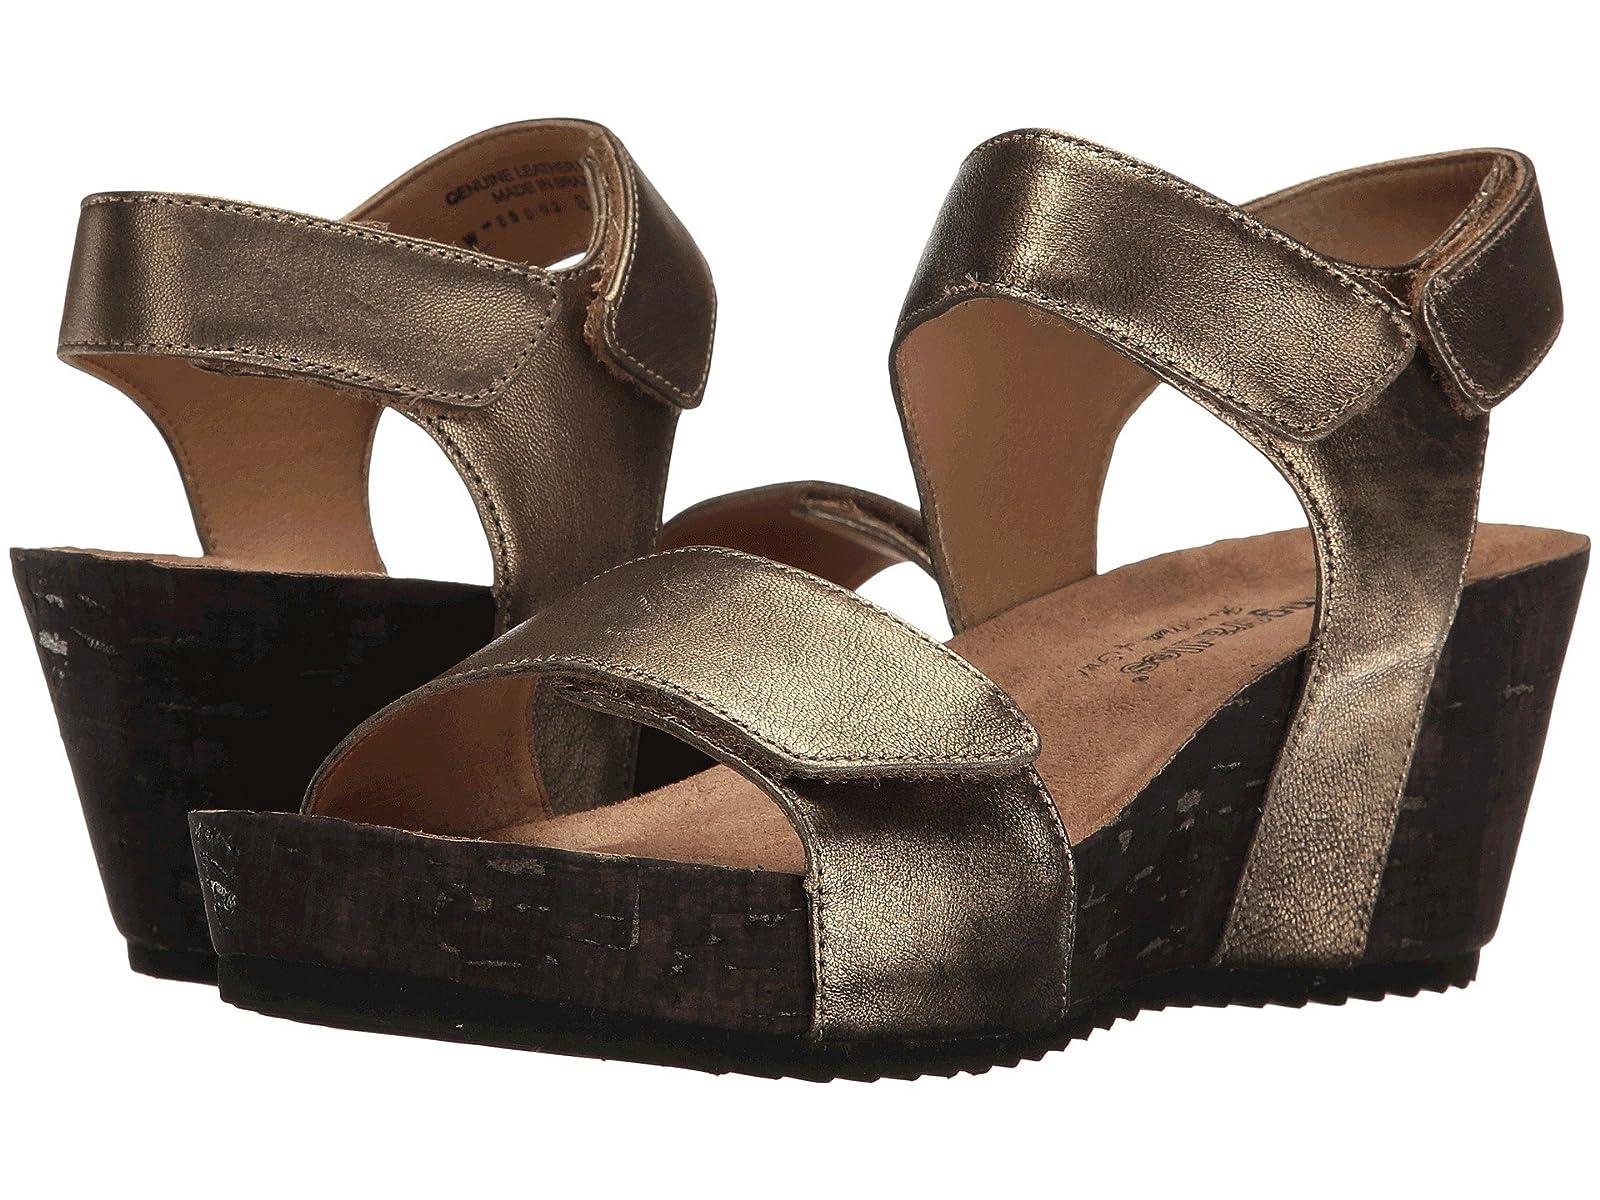 Walking Cradles ThetaCheap and distinctive eye-catching shoes